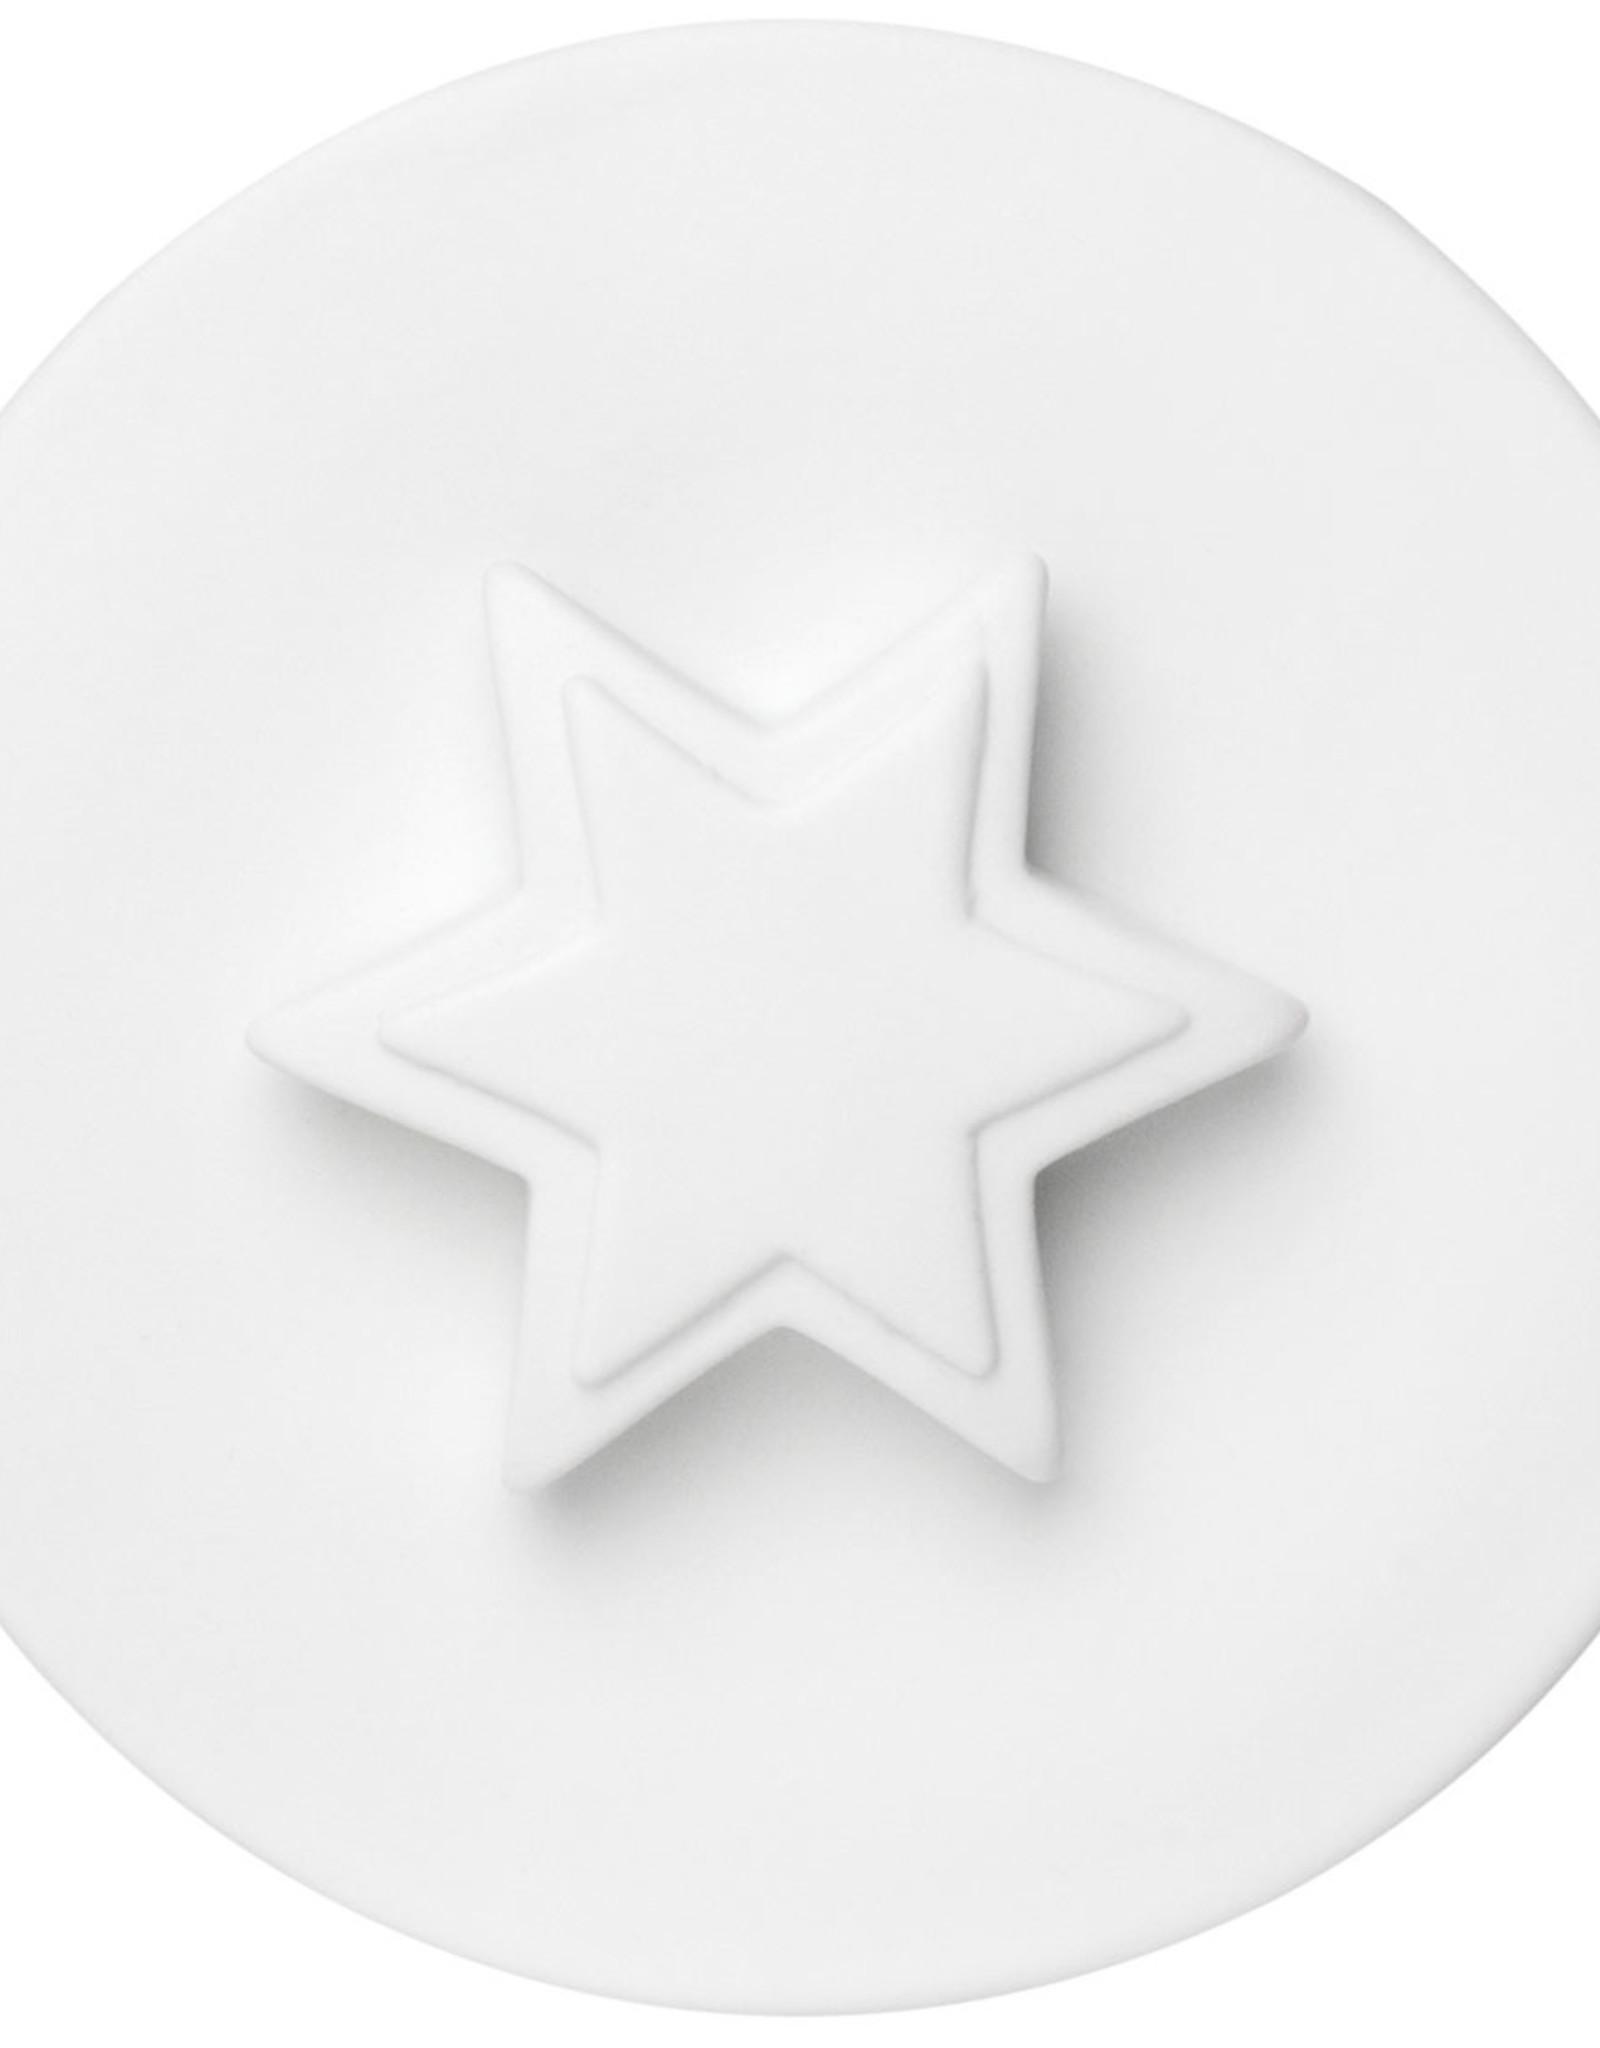 Rader Lovely Glass Jar Star